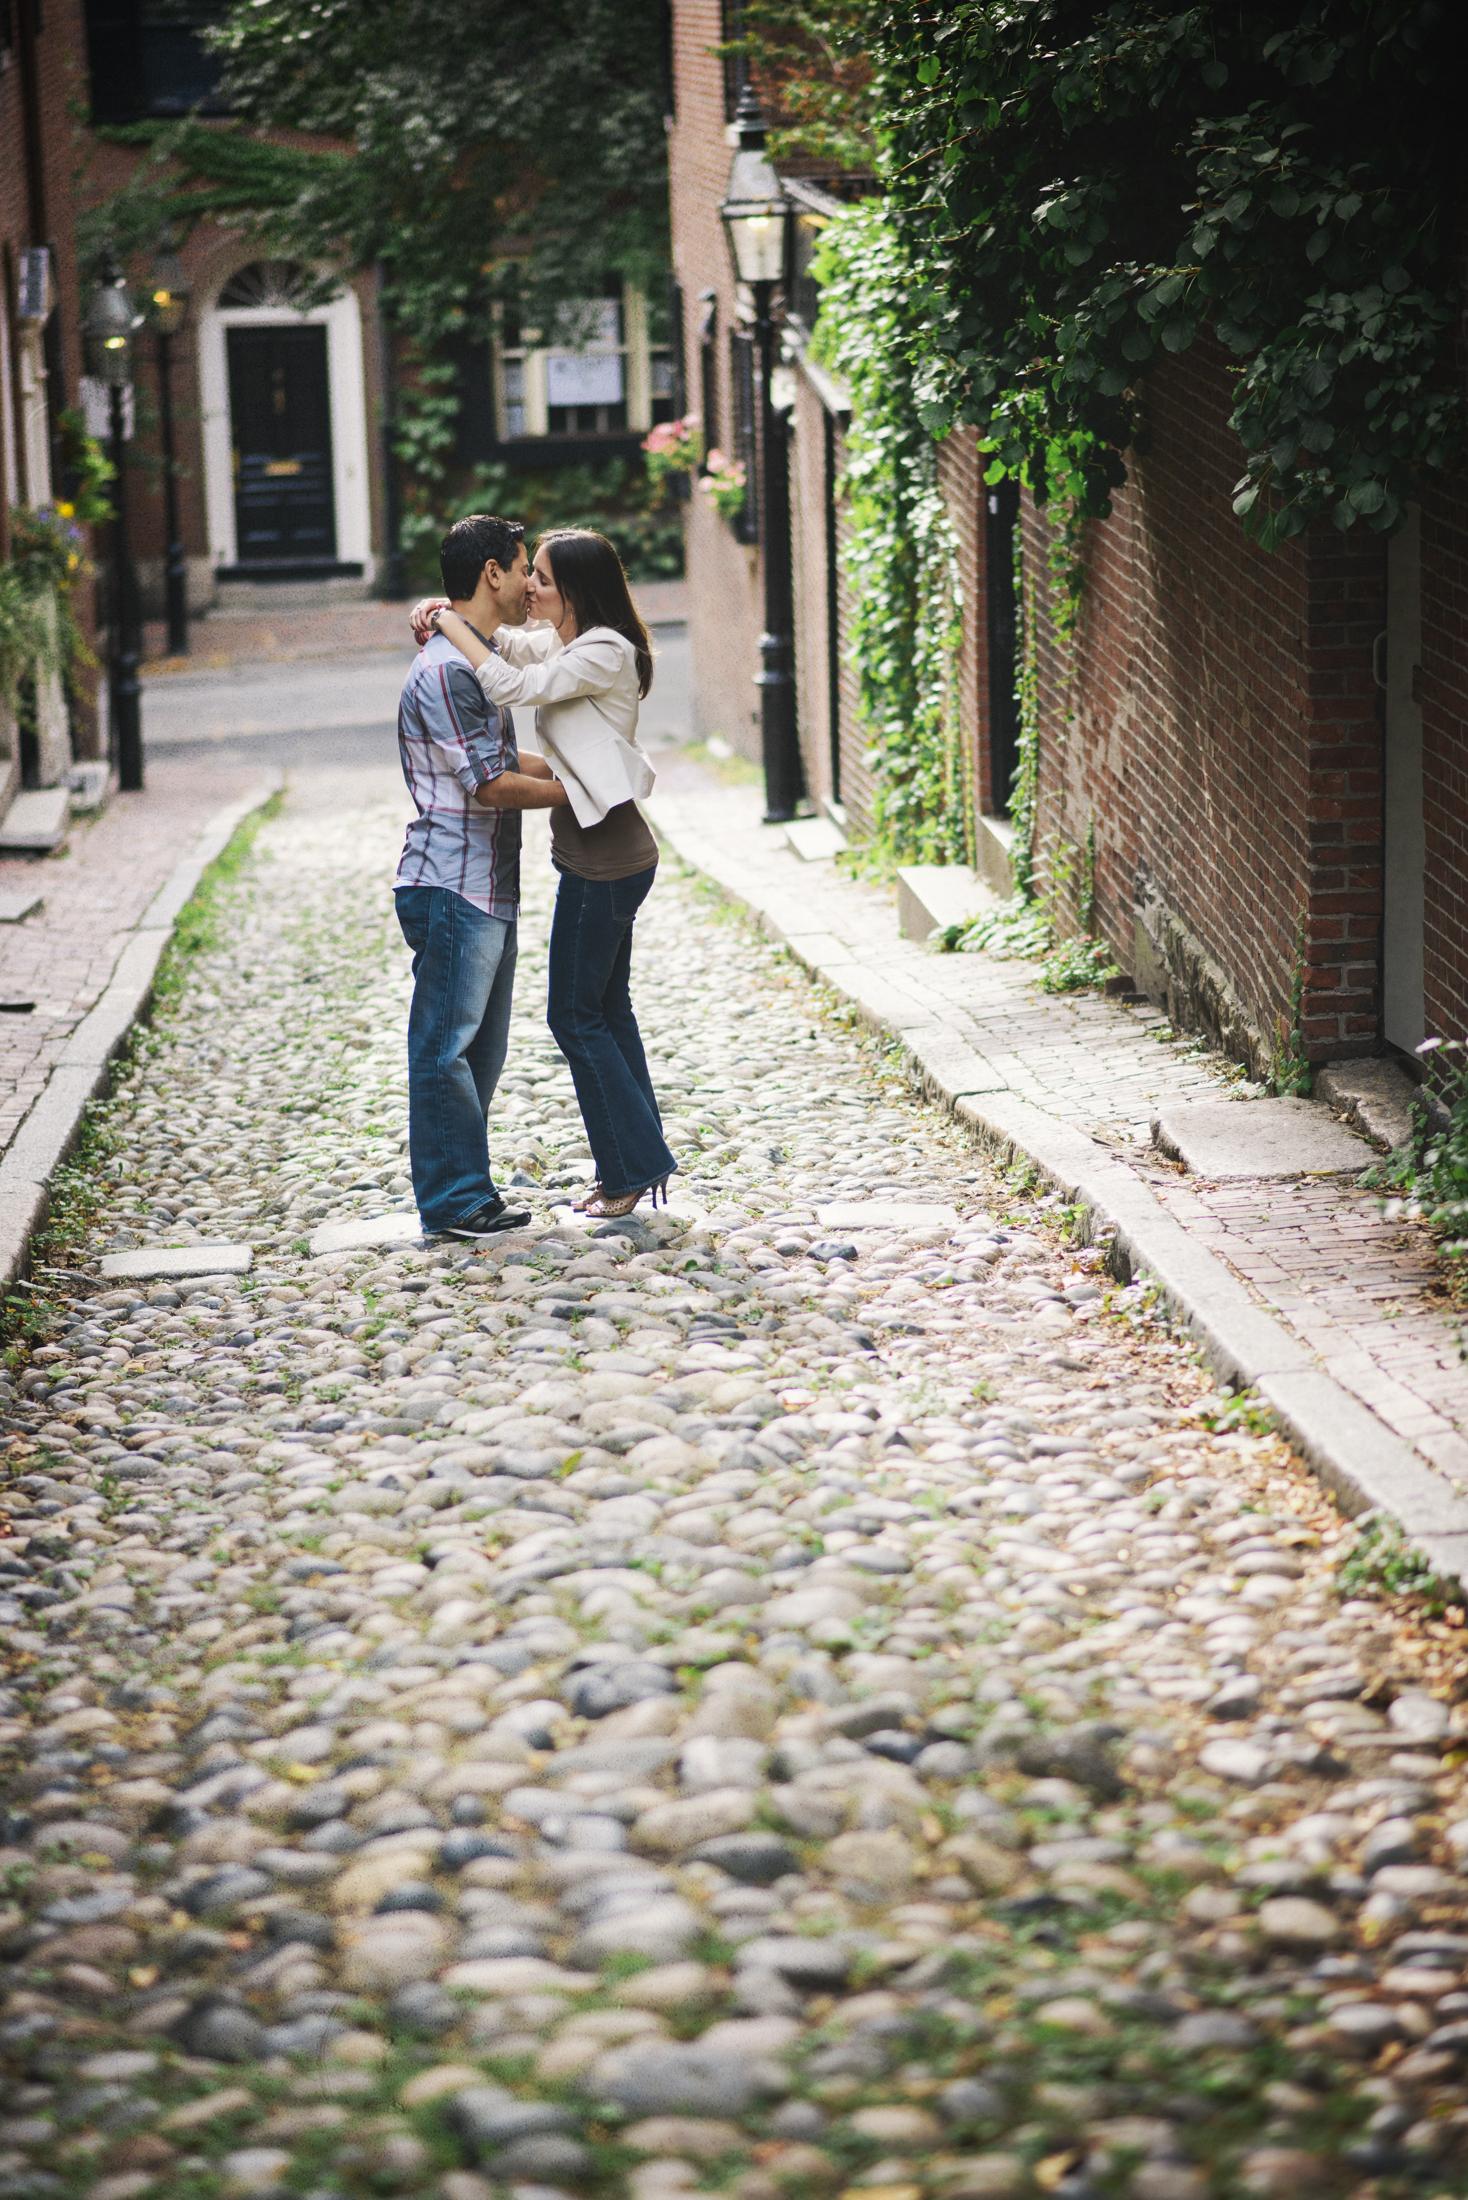 NH Wedding Photographer: Acorn Street Boston engagement session